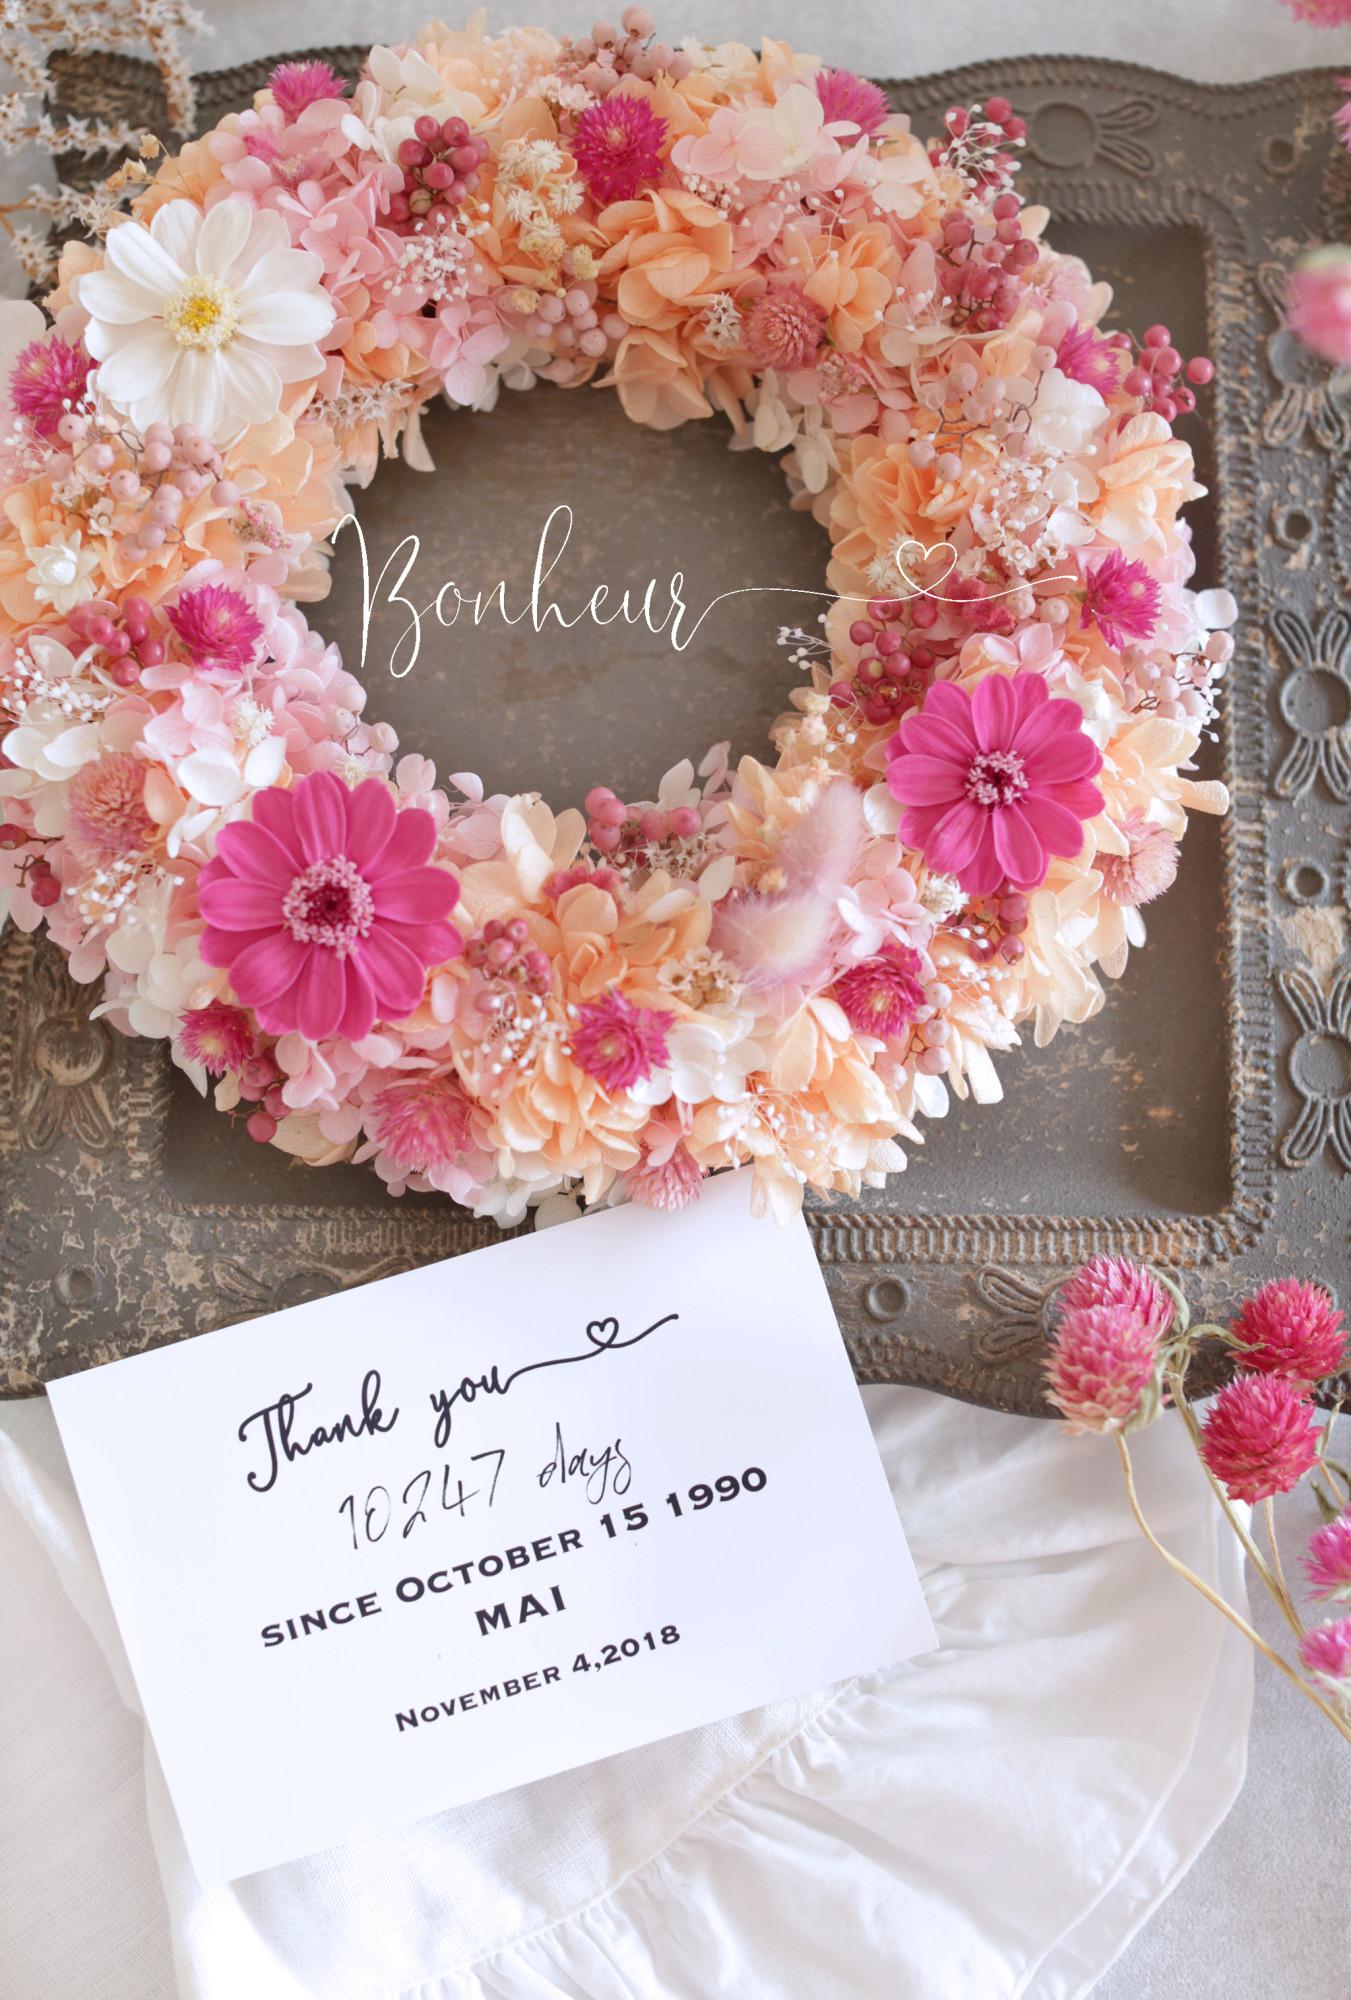 b_wreath20181013_1